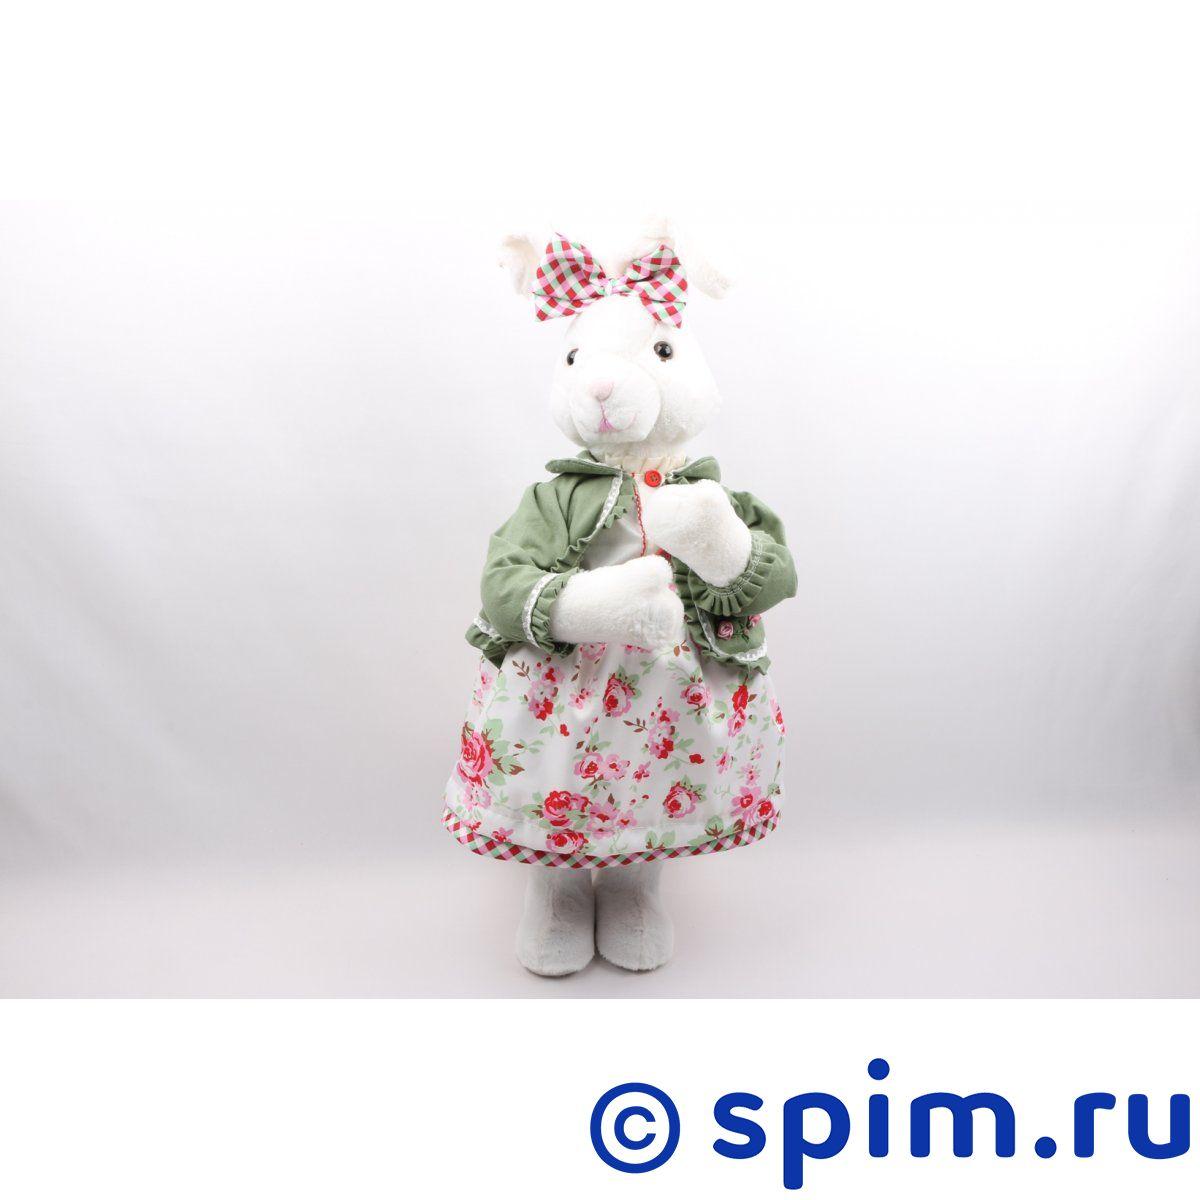 Интерьерная кукла Зайка C21-288054